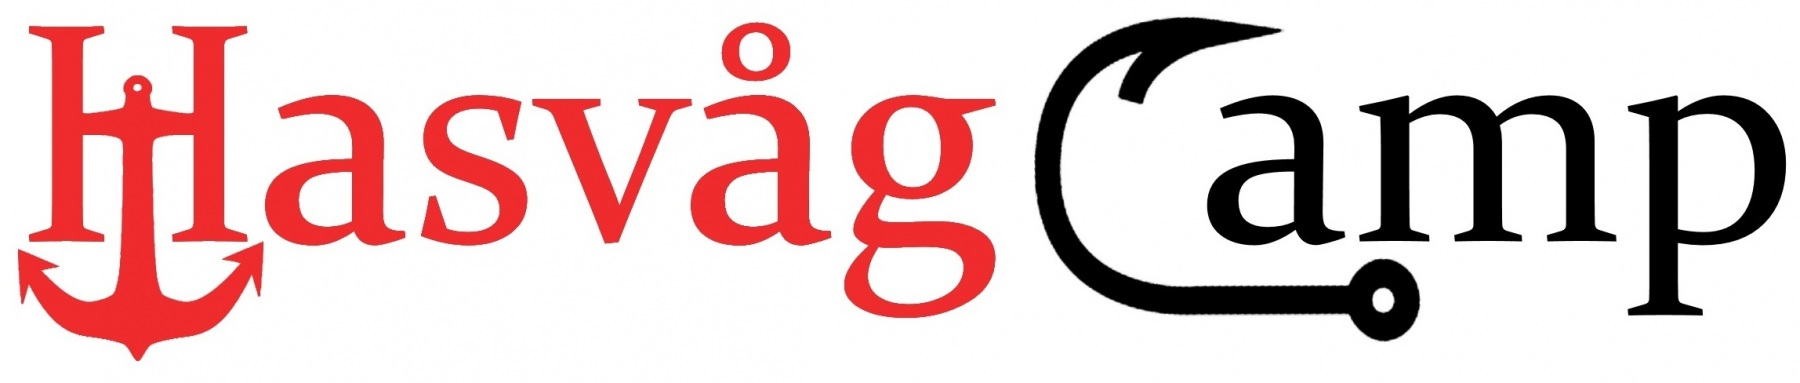 HasvagCamp